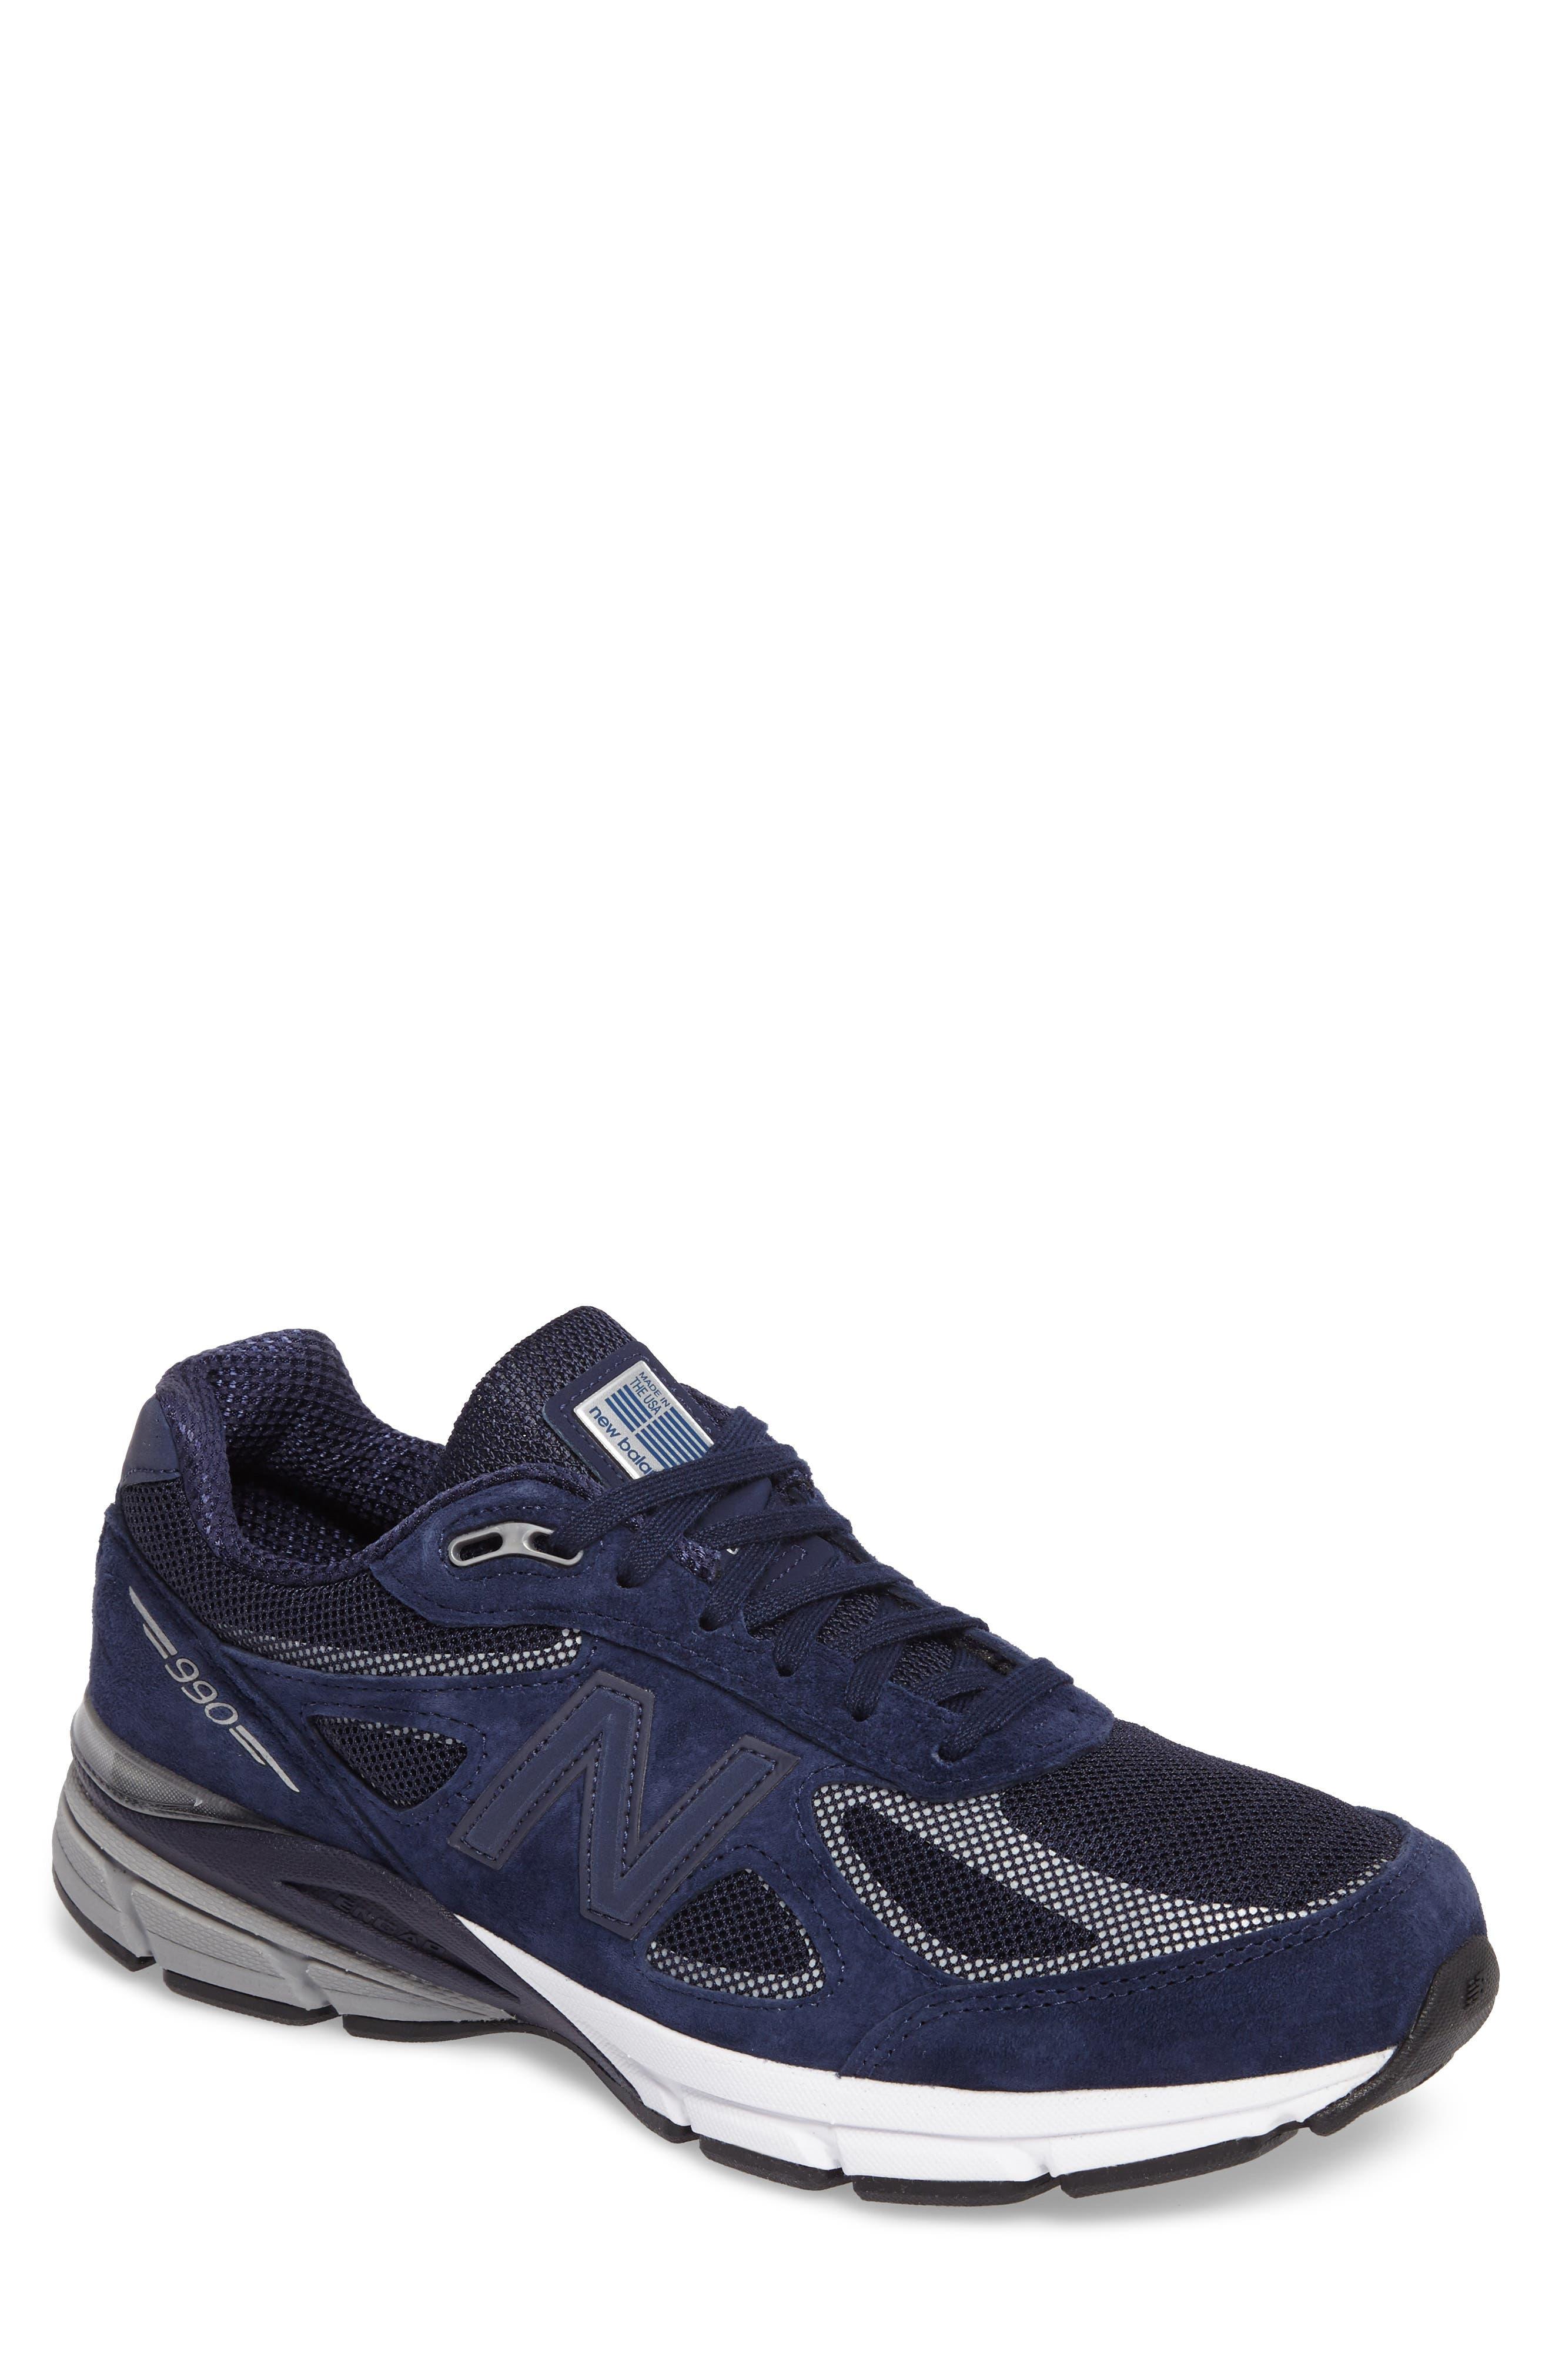 New Balance Reflective 990v4 Running Shoe (Men)